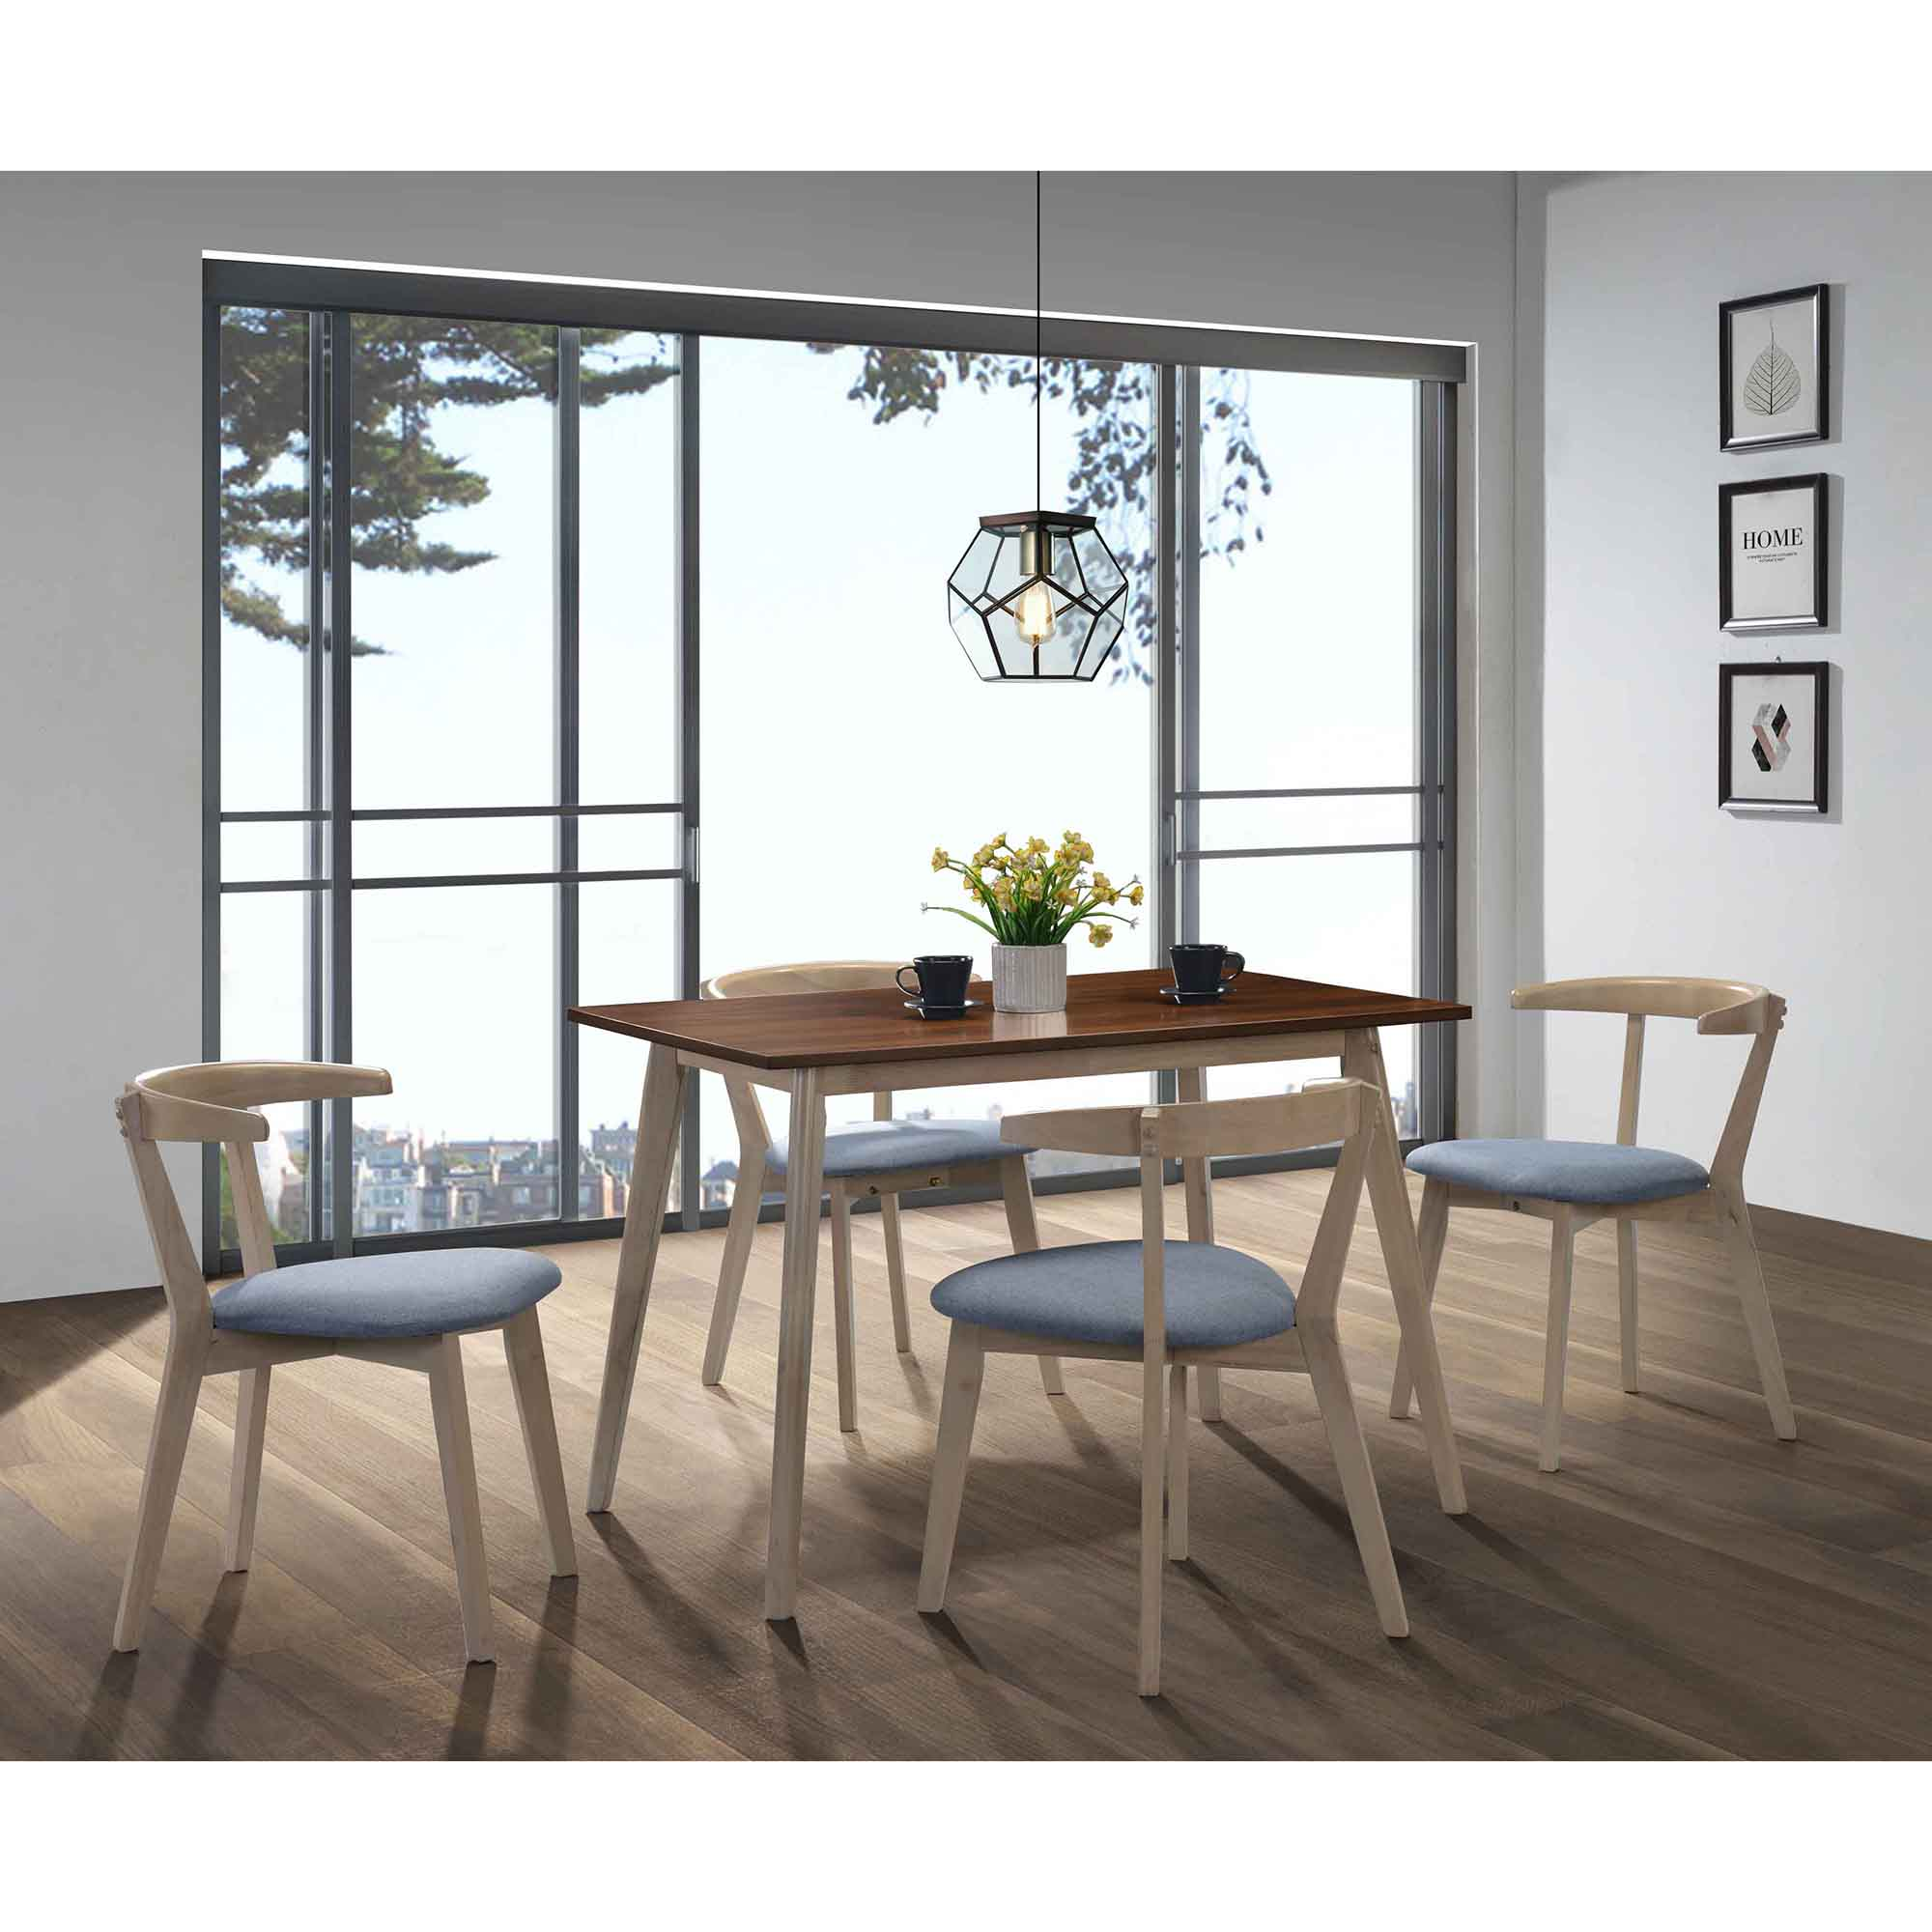 Fotografie Masa dining Kring Mod, lemn / MDF, 110x70x74 cm, Crem